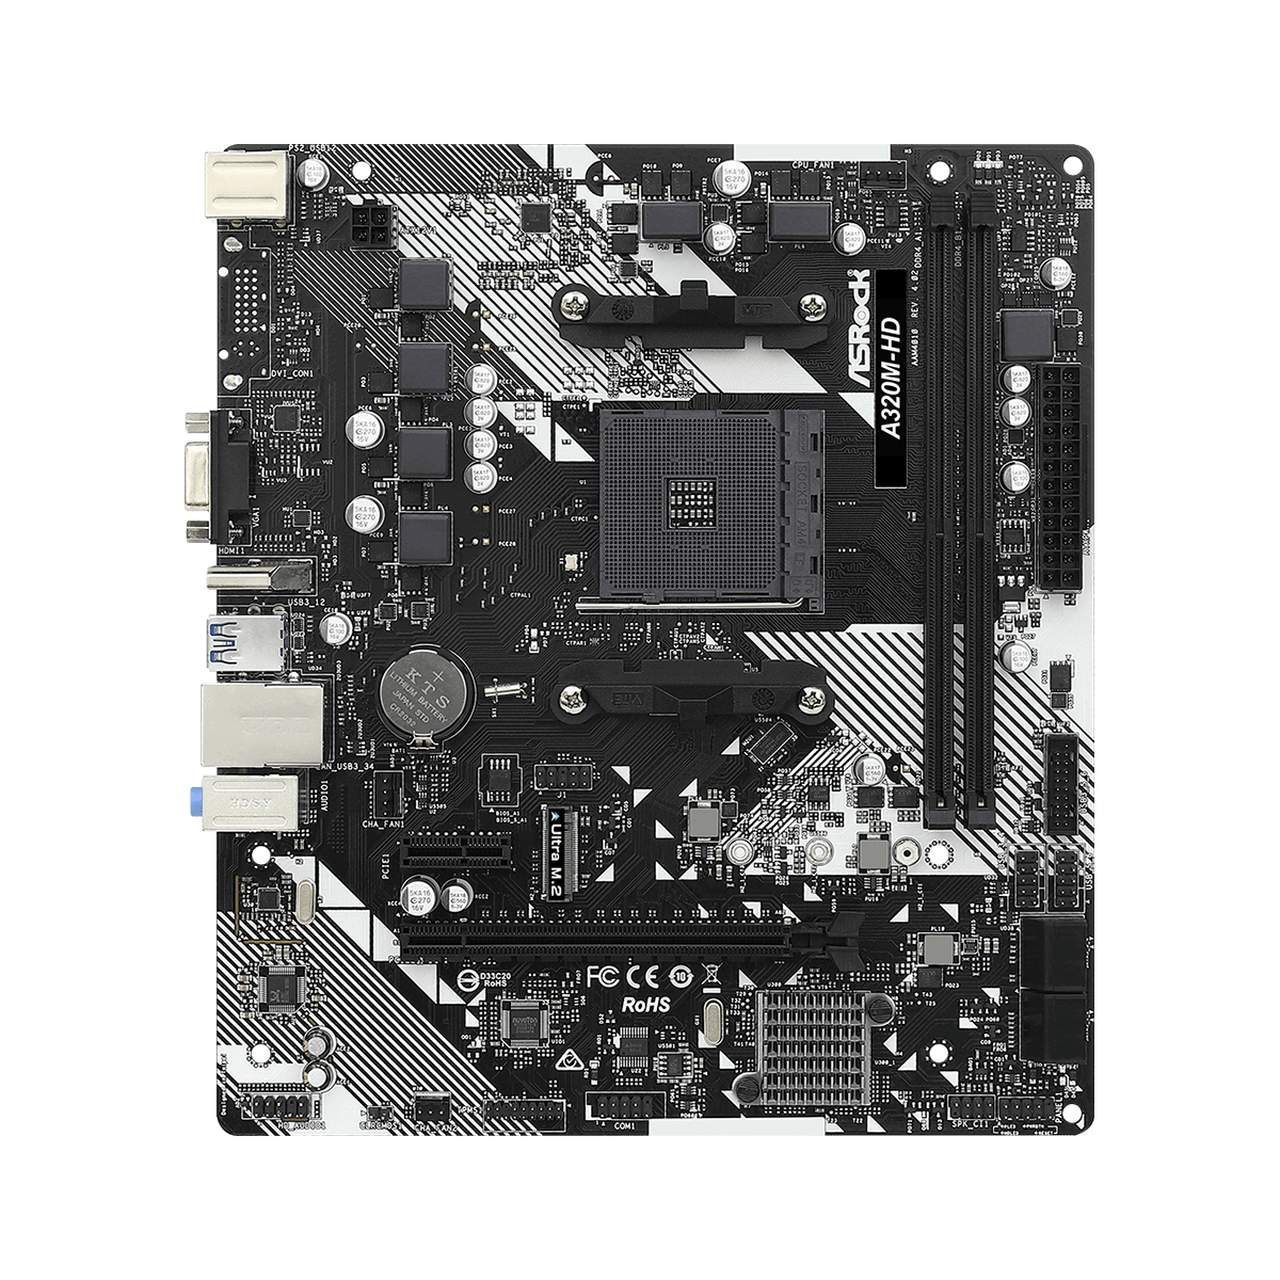 Placa Mãe ASRock A320M-HD R4.0 Chipset A320 AMD AM4 mATX DDR4